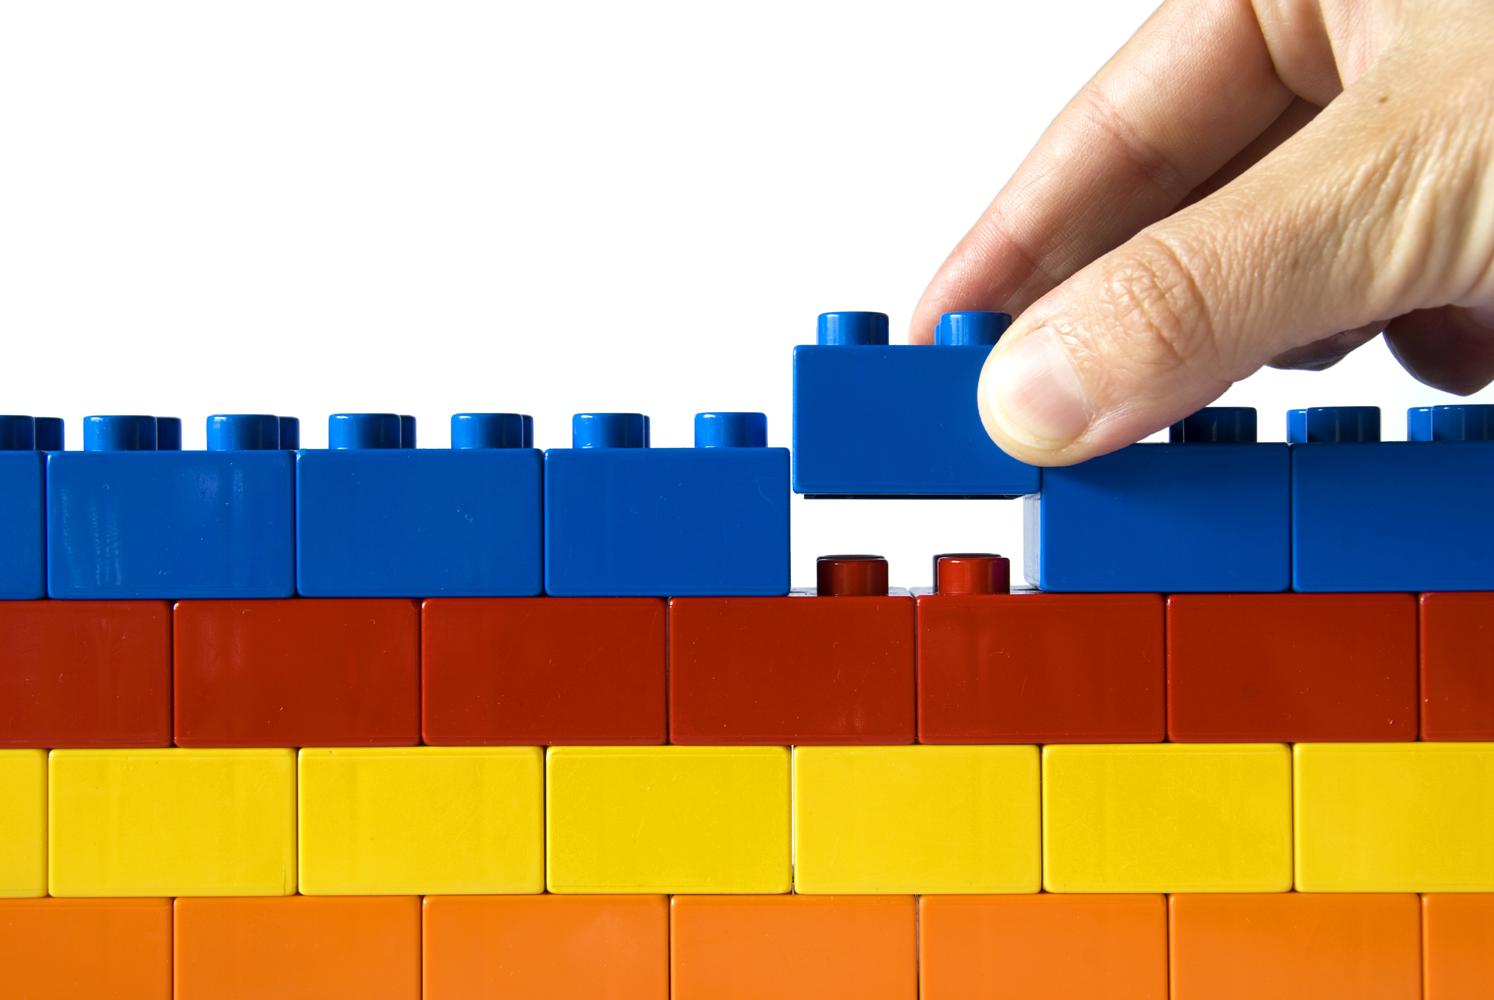 Build Block of a Team